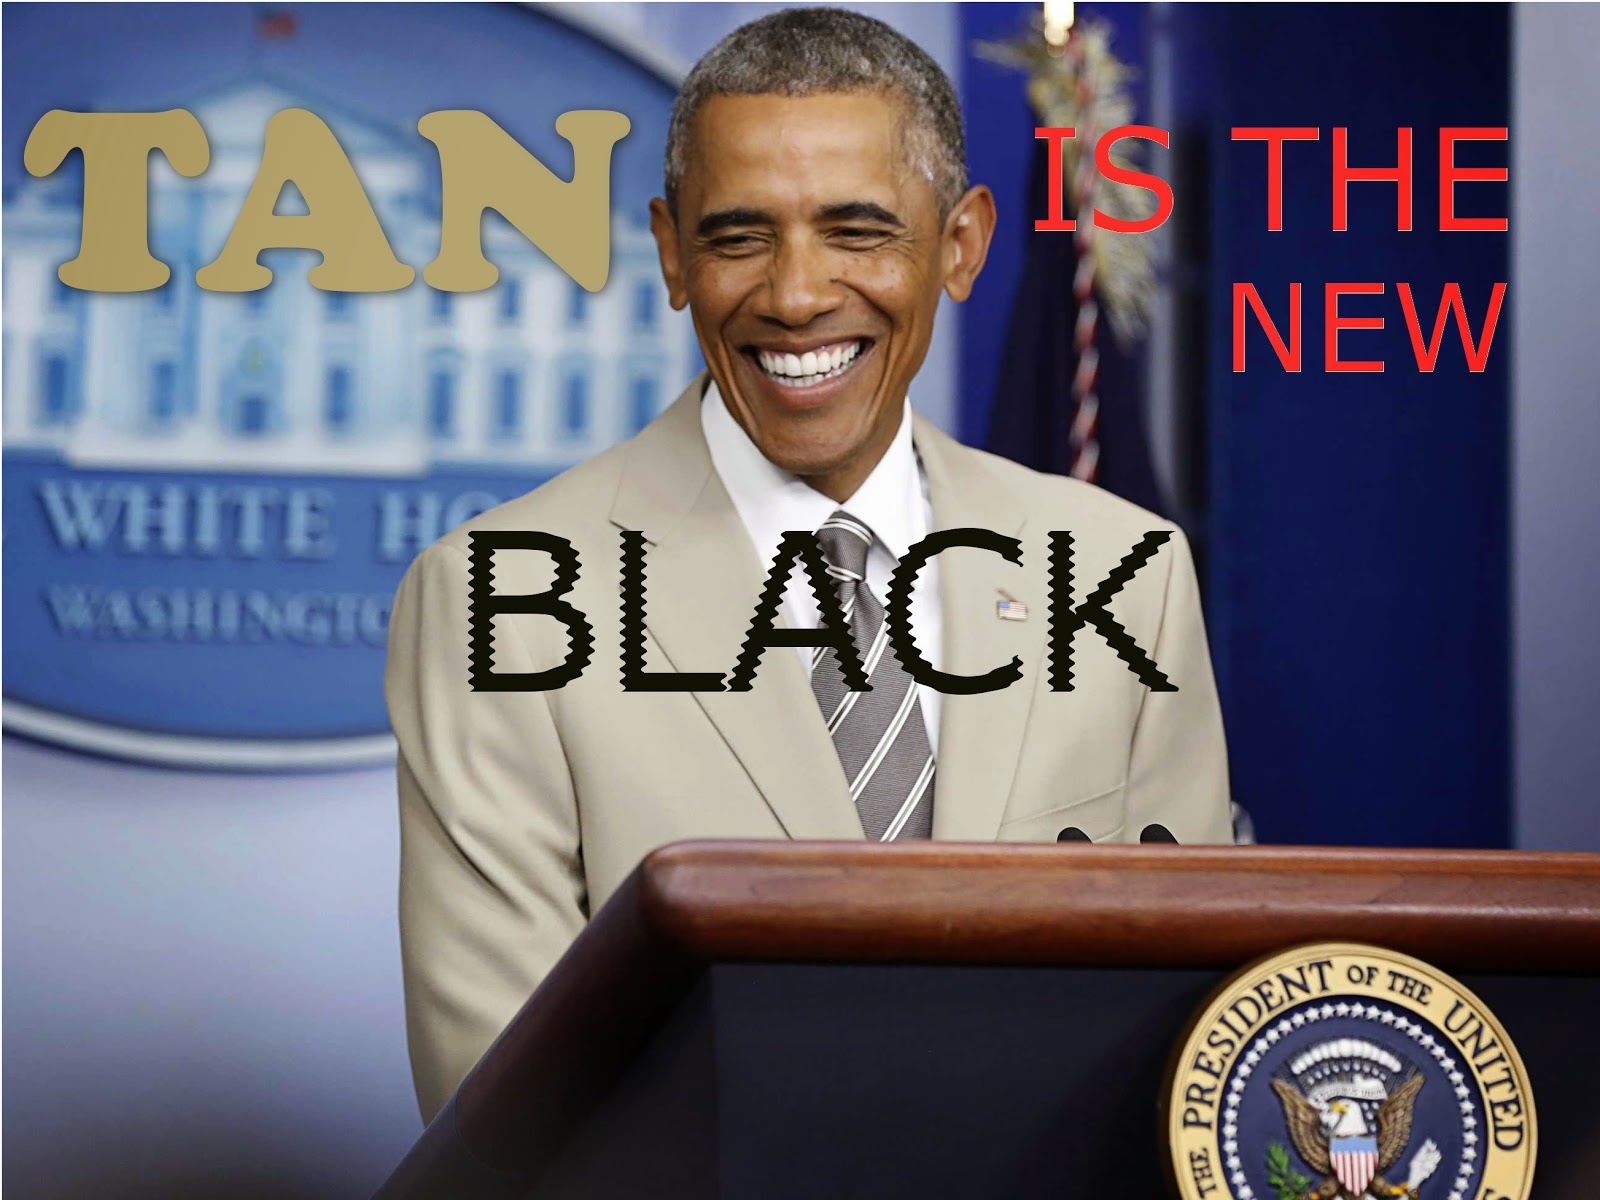 President Barack Obama in suitgate